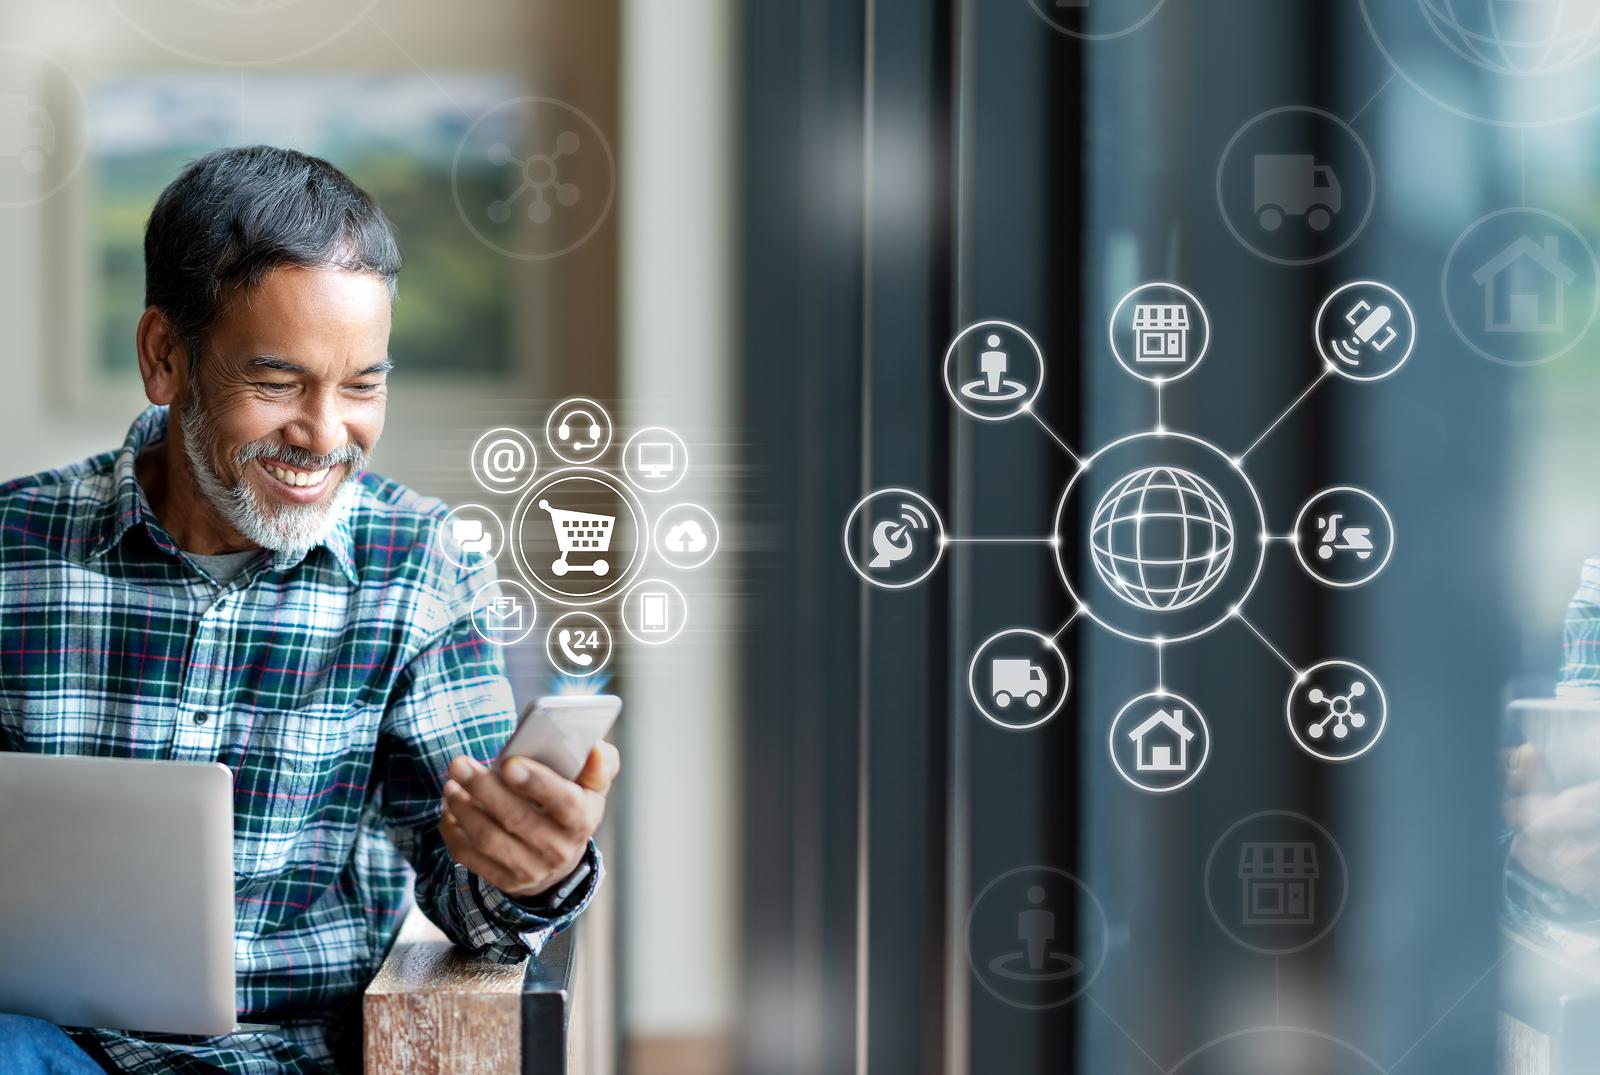 Customer Orders Using CRM Data